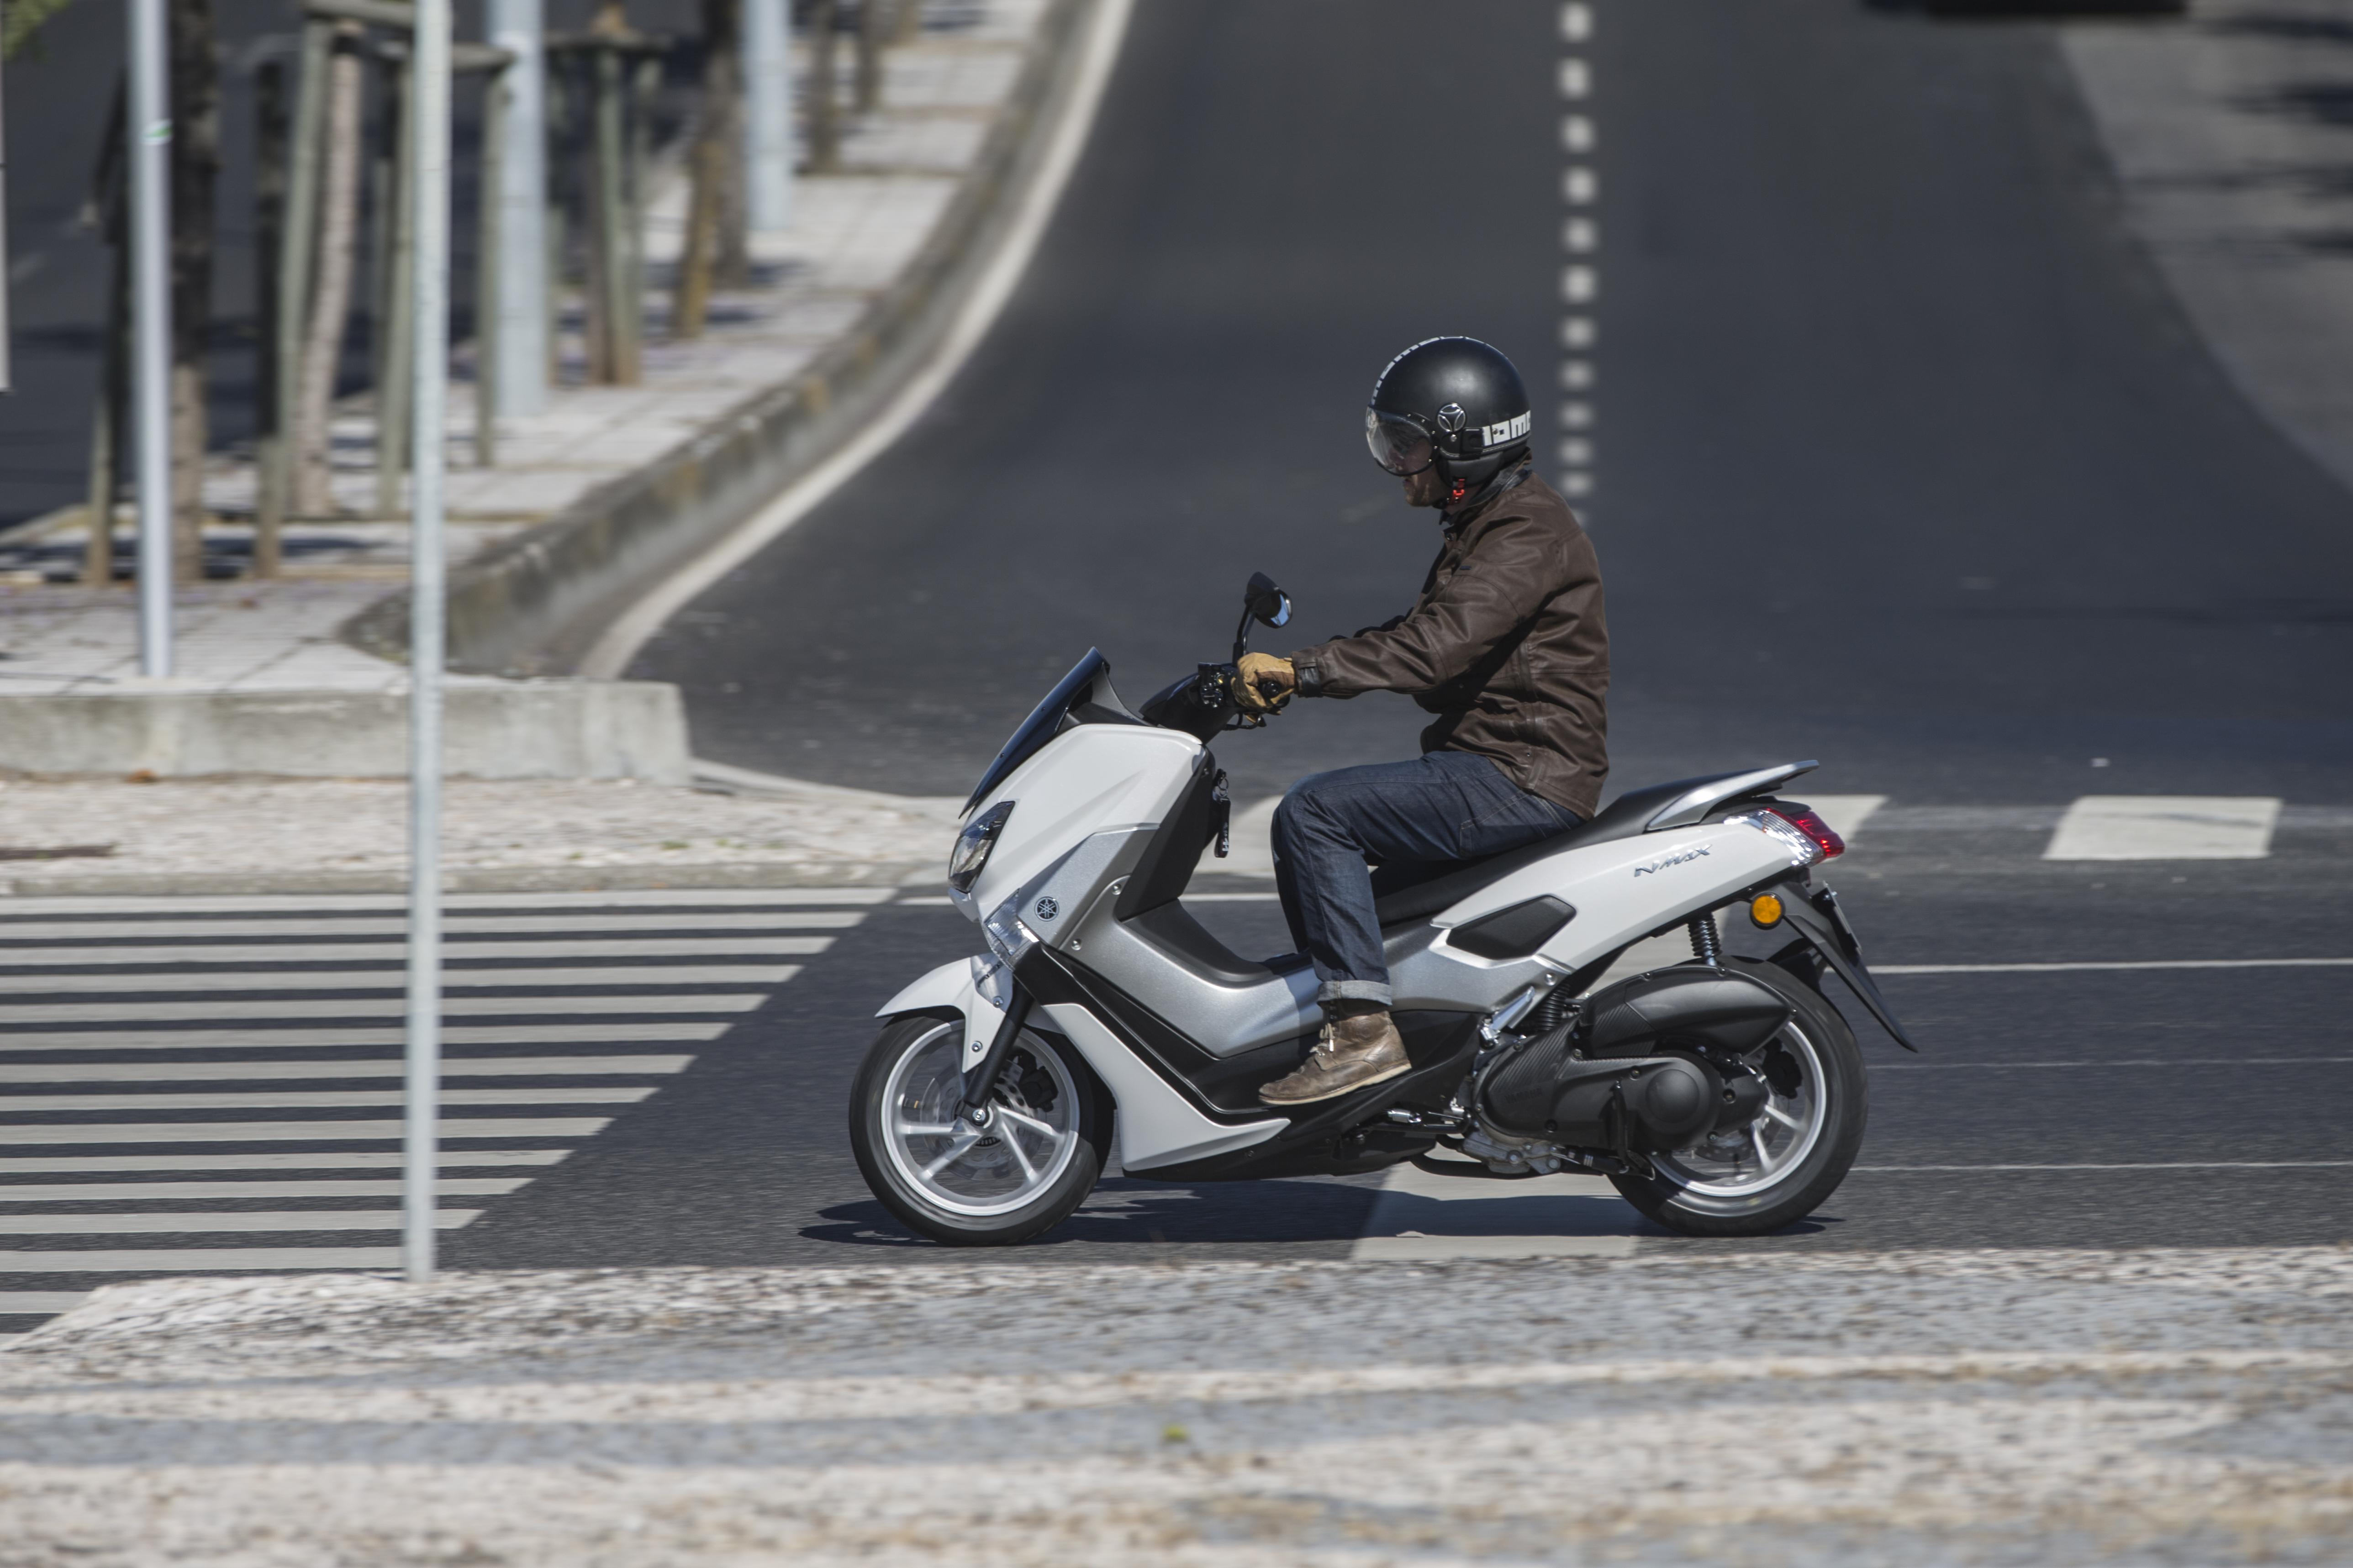 Honda Build And Price >> First ride: Yamaha NMAX 125 review | Visordown